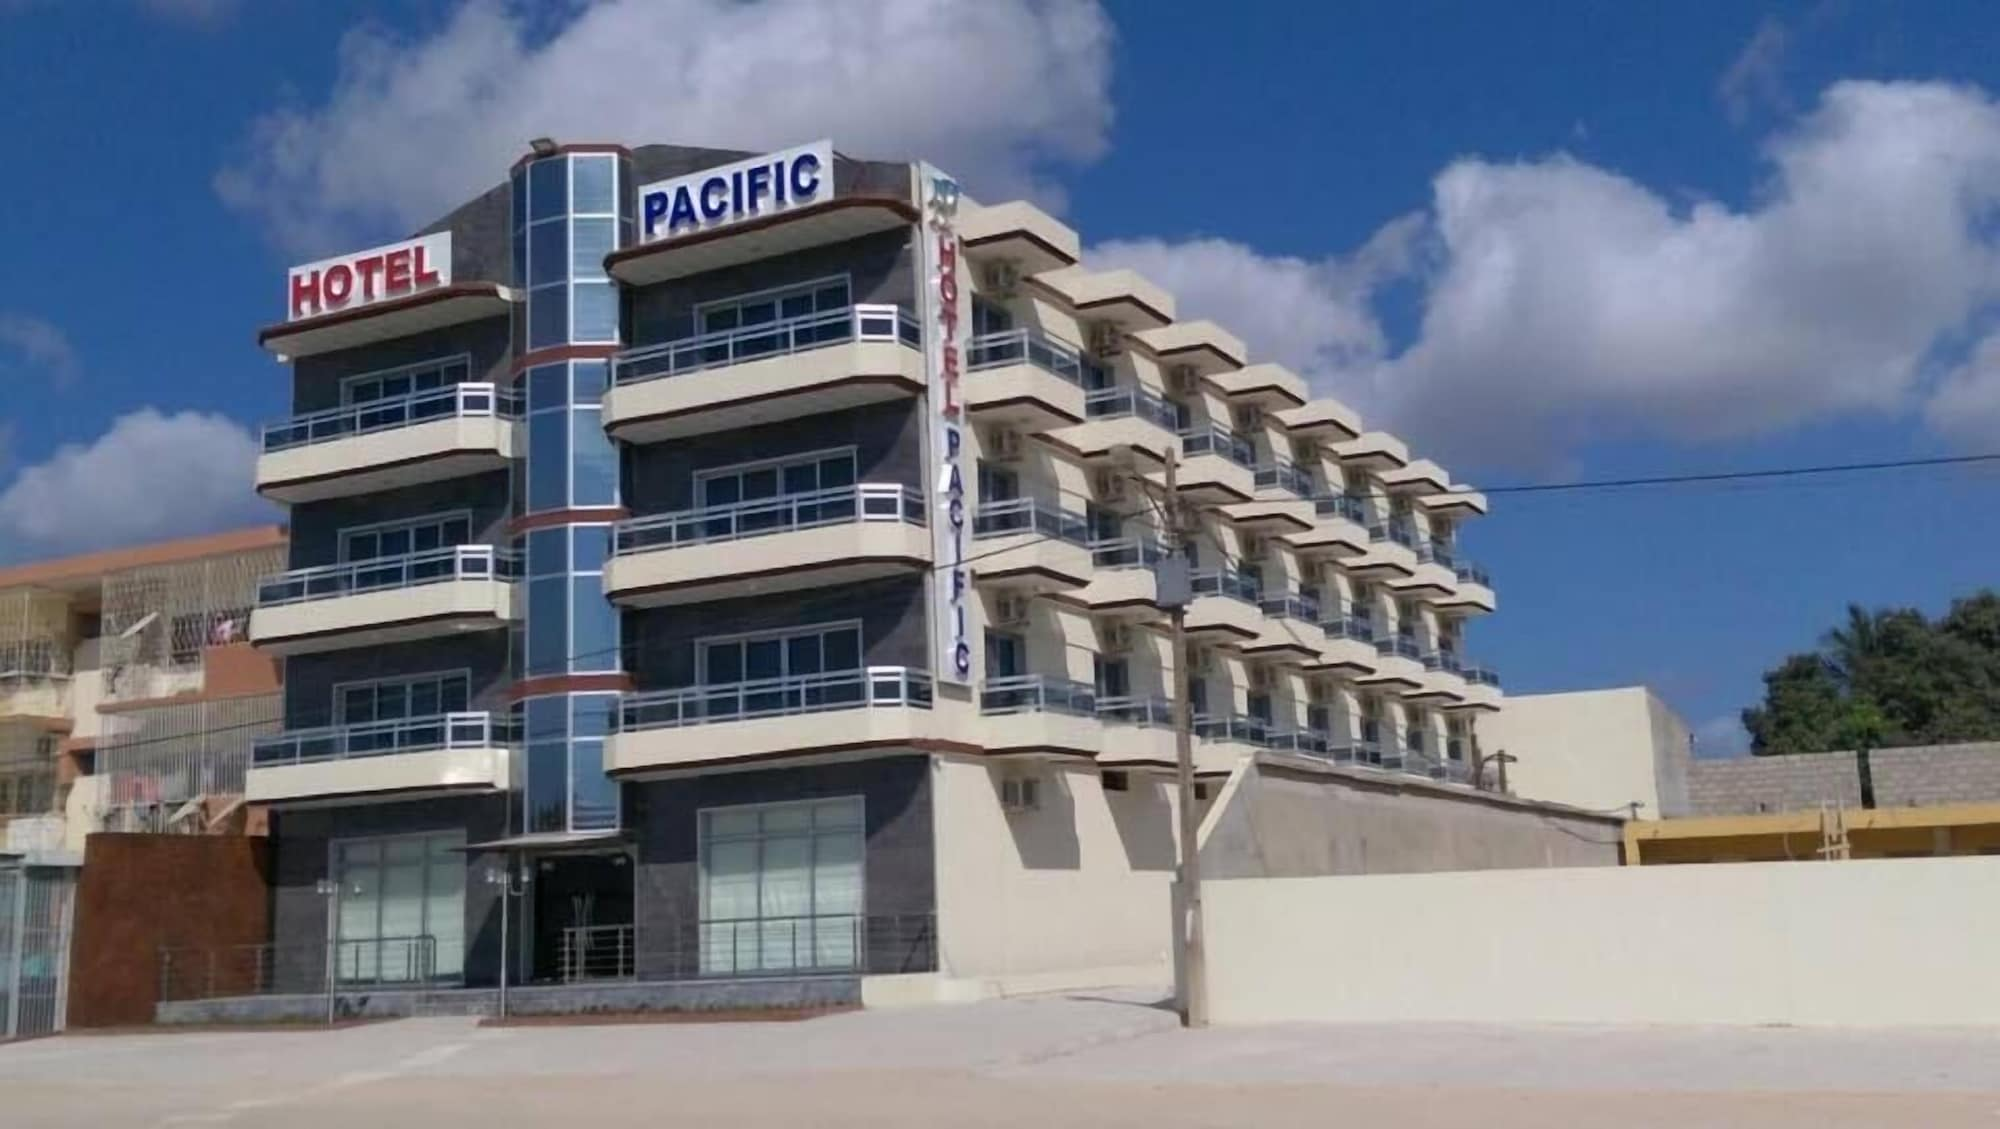 Hotel Pacific, Nacala Velha